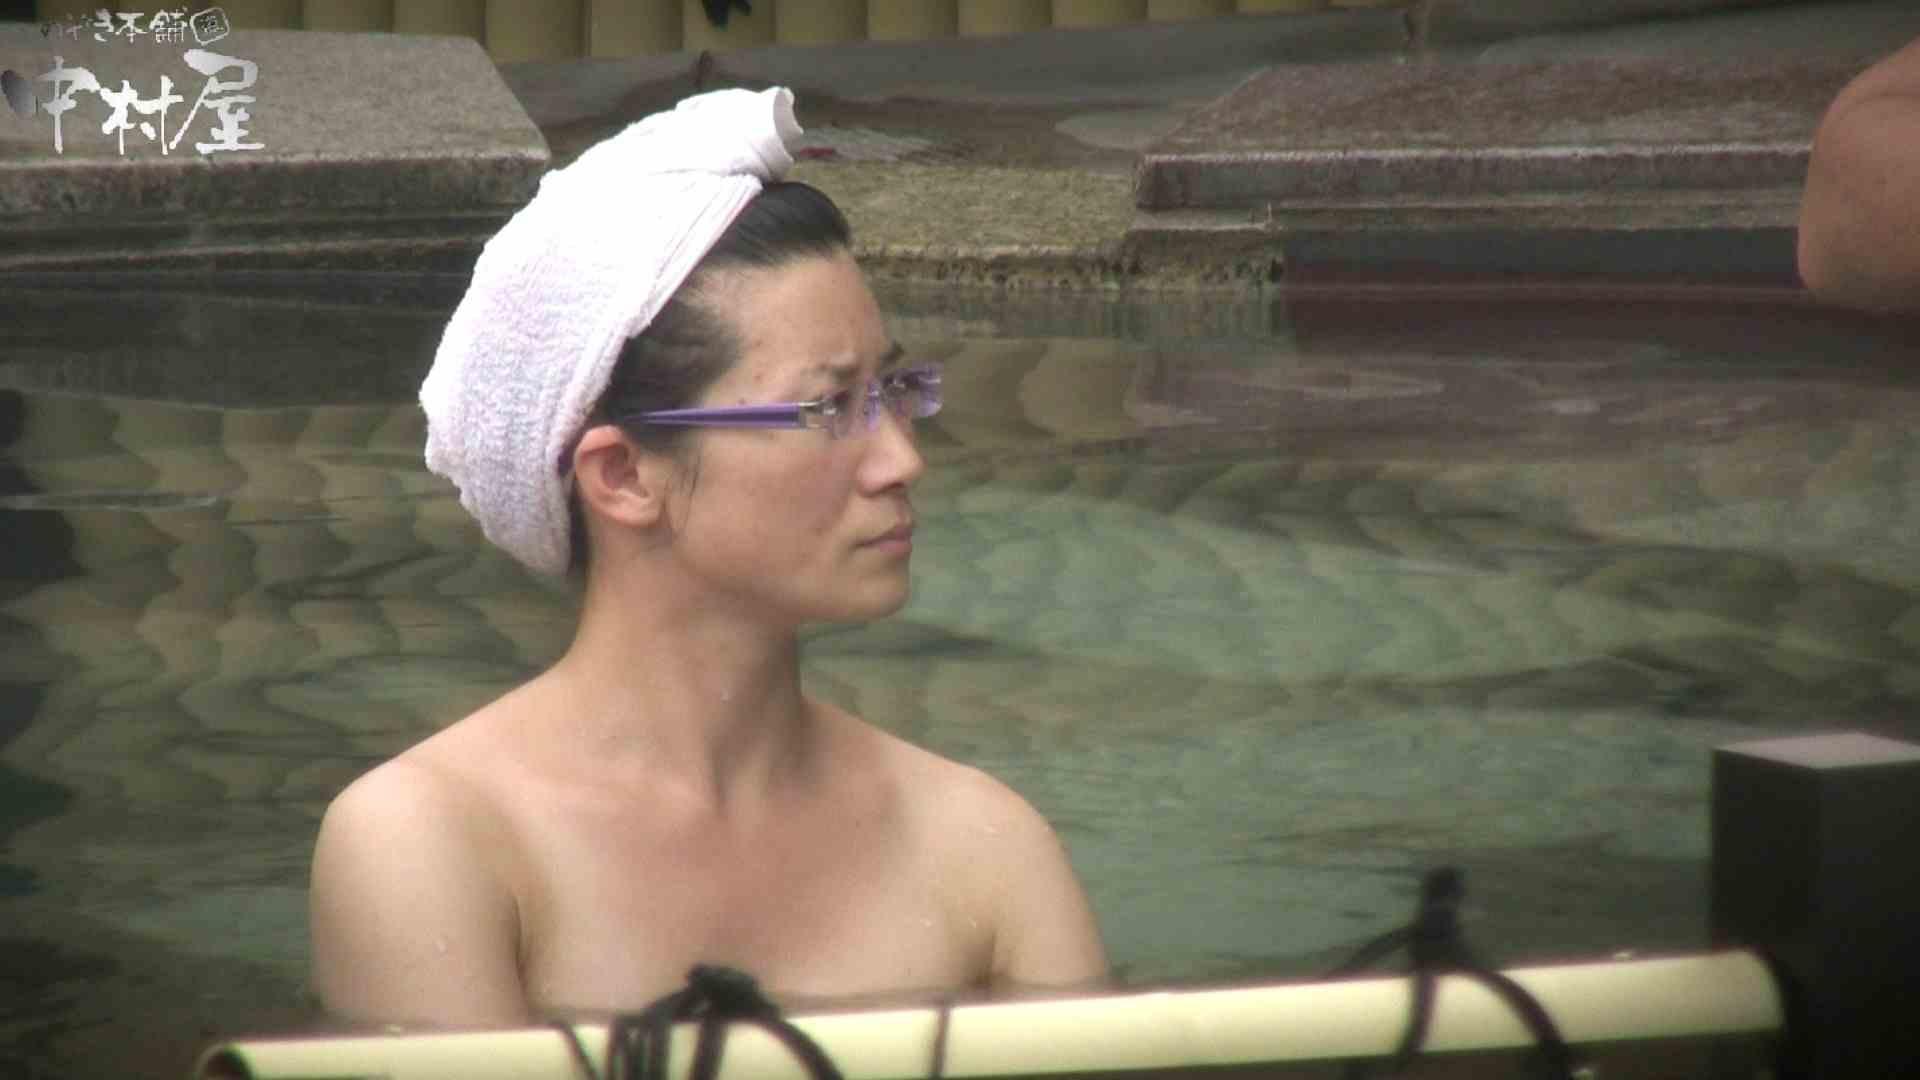 Aquaな露天風呂Vol.905 露天風呂   OLのエロ生活  99連発 40